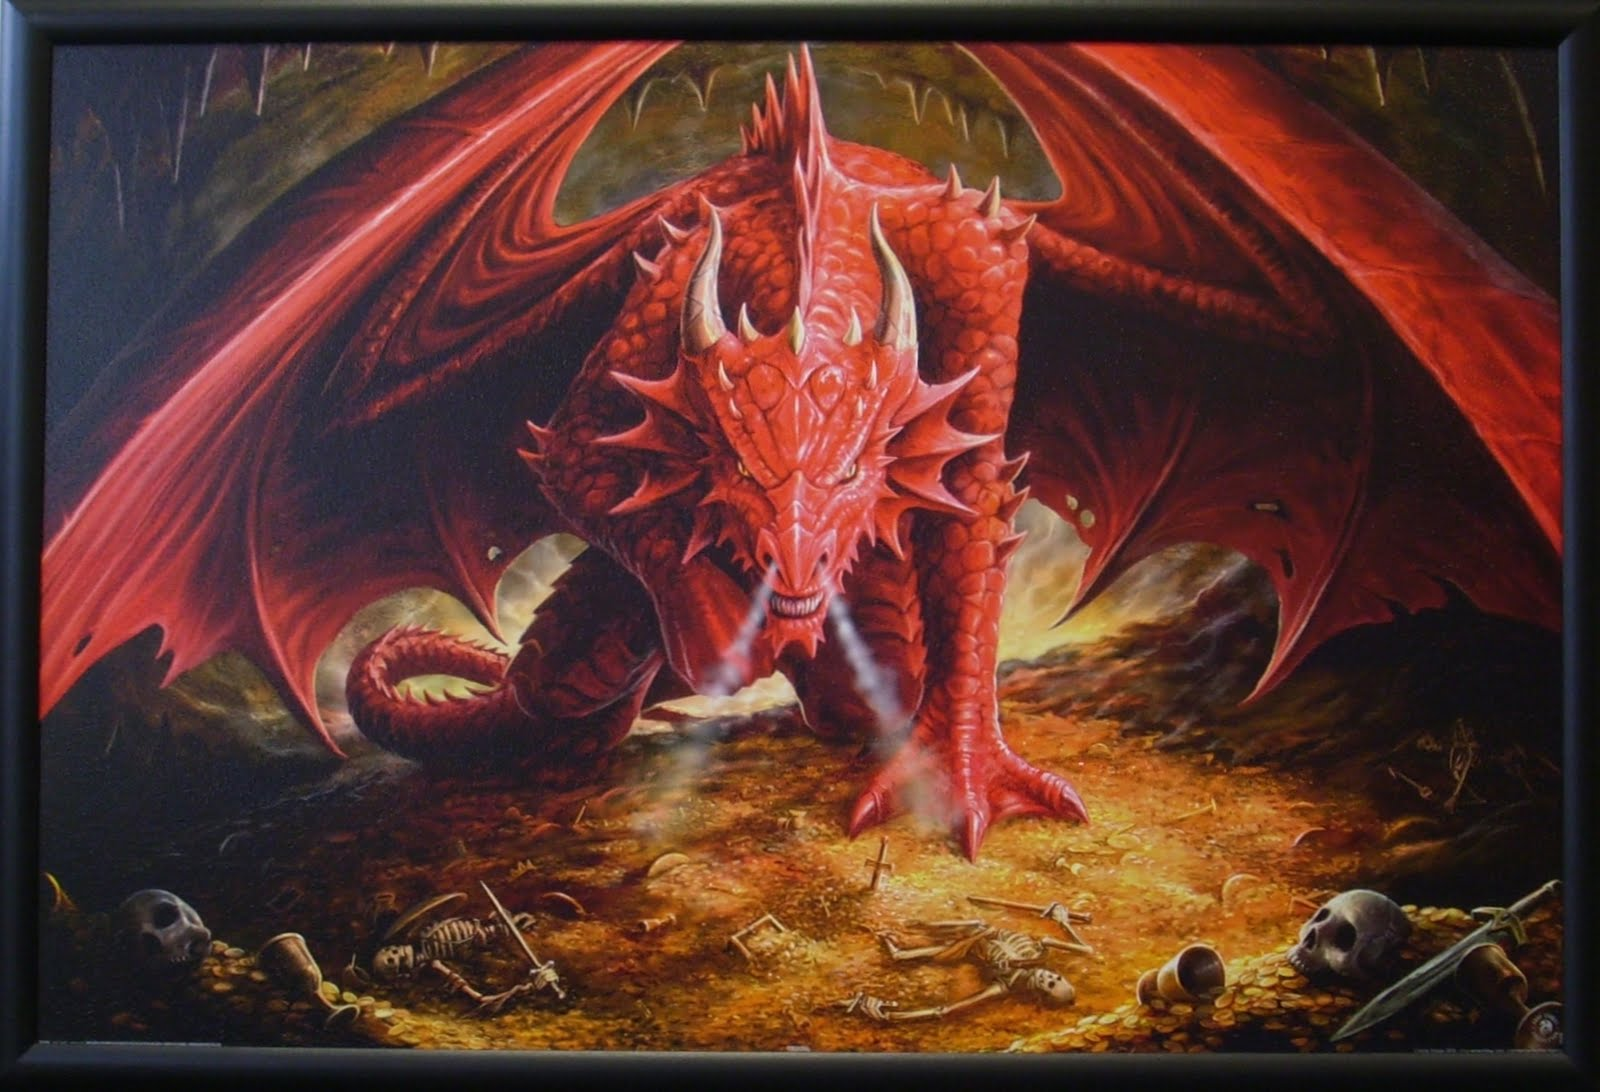 Roter Drache Bild